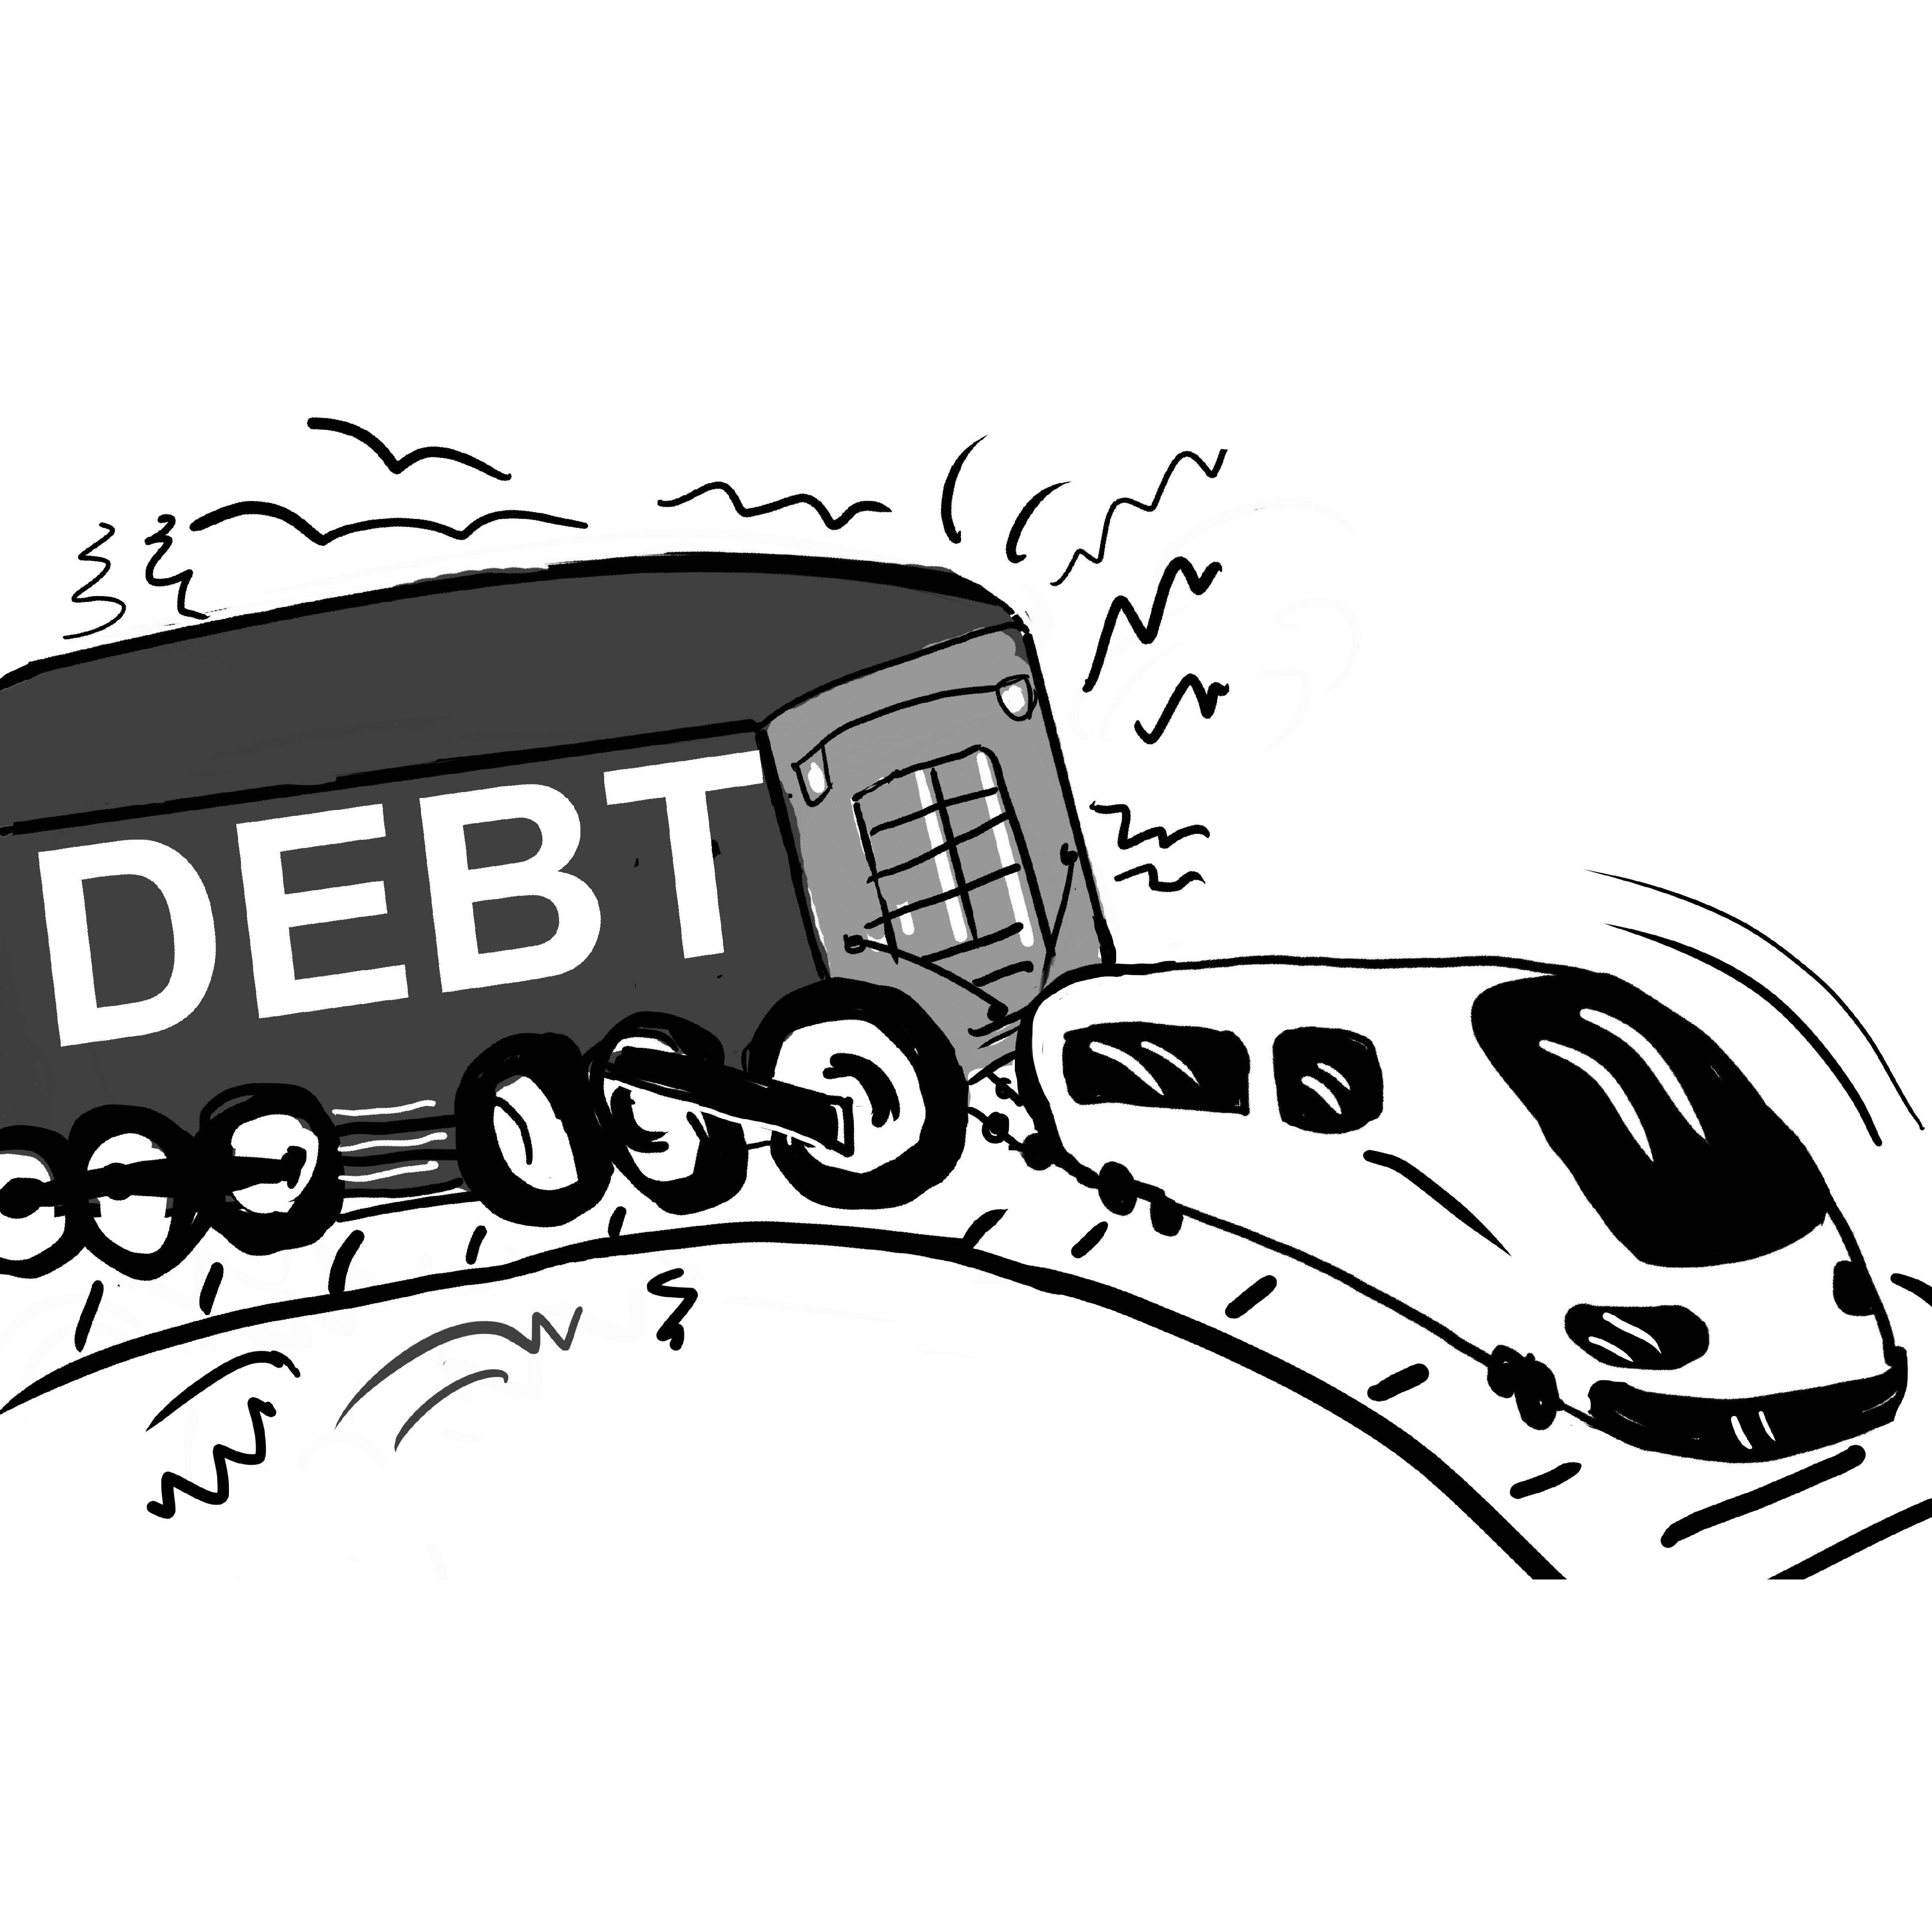 High-speed trains, high-scale debt